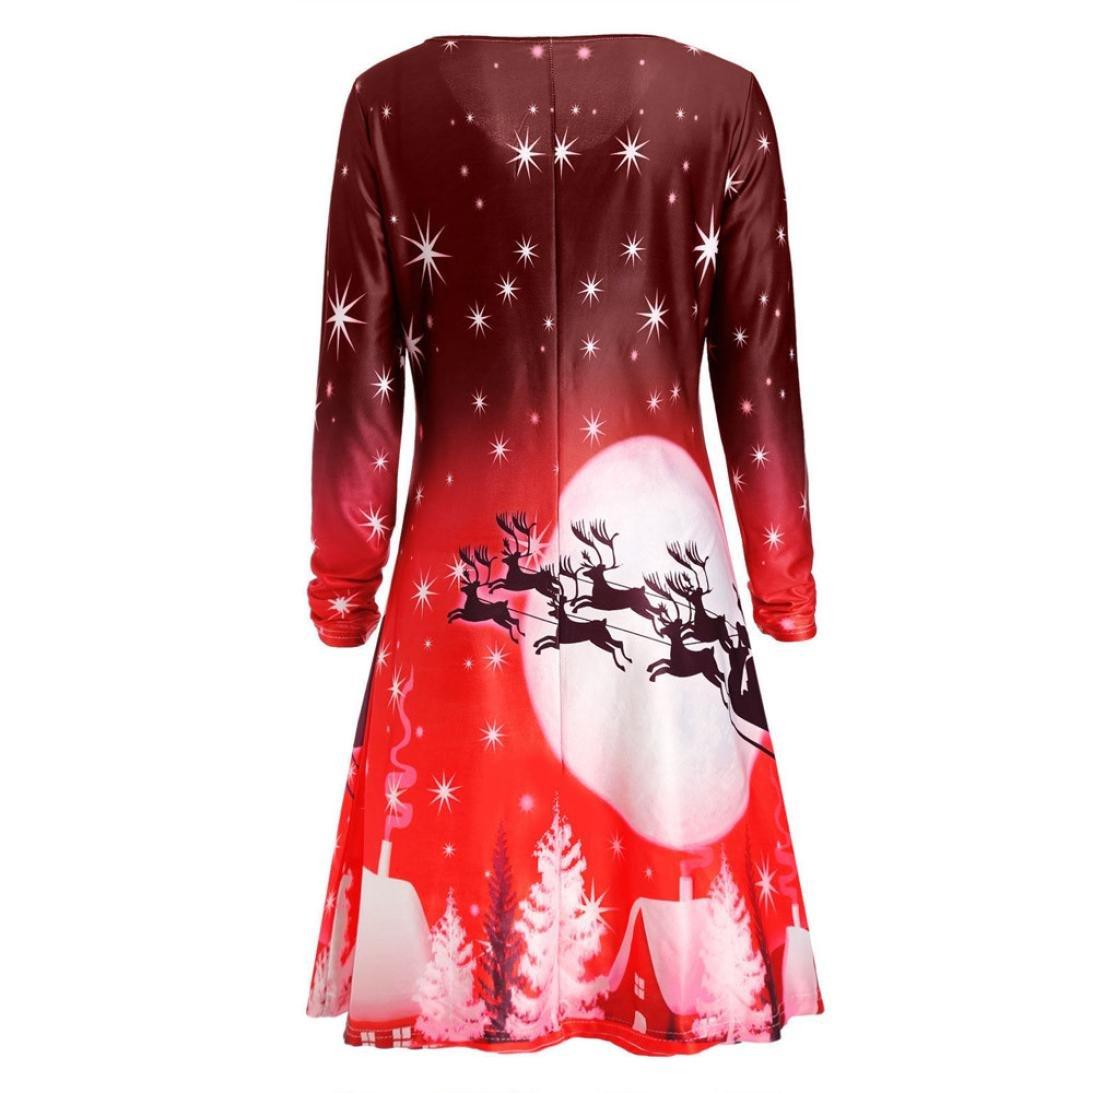 910a3c12efca Amazon.com  Longay Women s Plus Size Christmas Print Long Sleeve Shirt  Dress Tunic Blouse Tops Mini Club Shirt Dress (Green